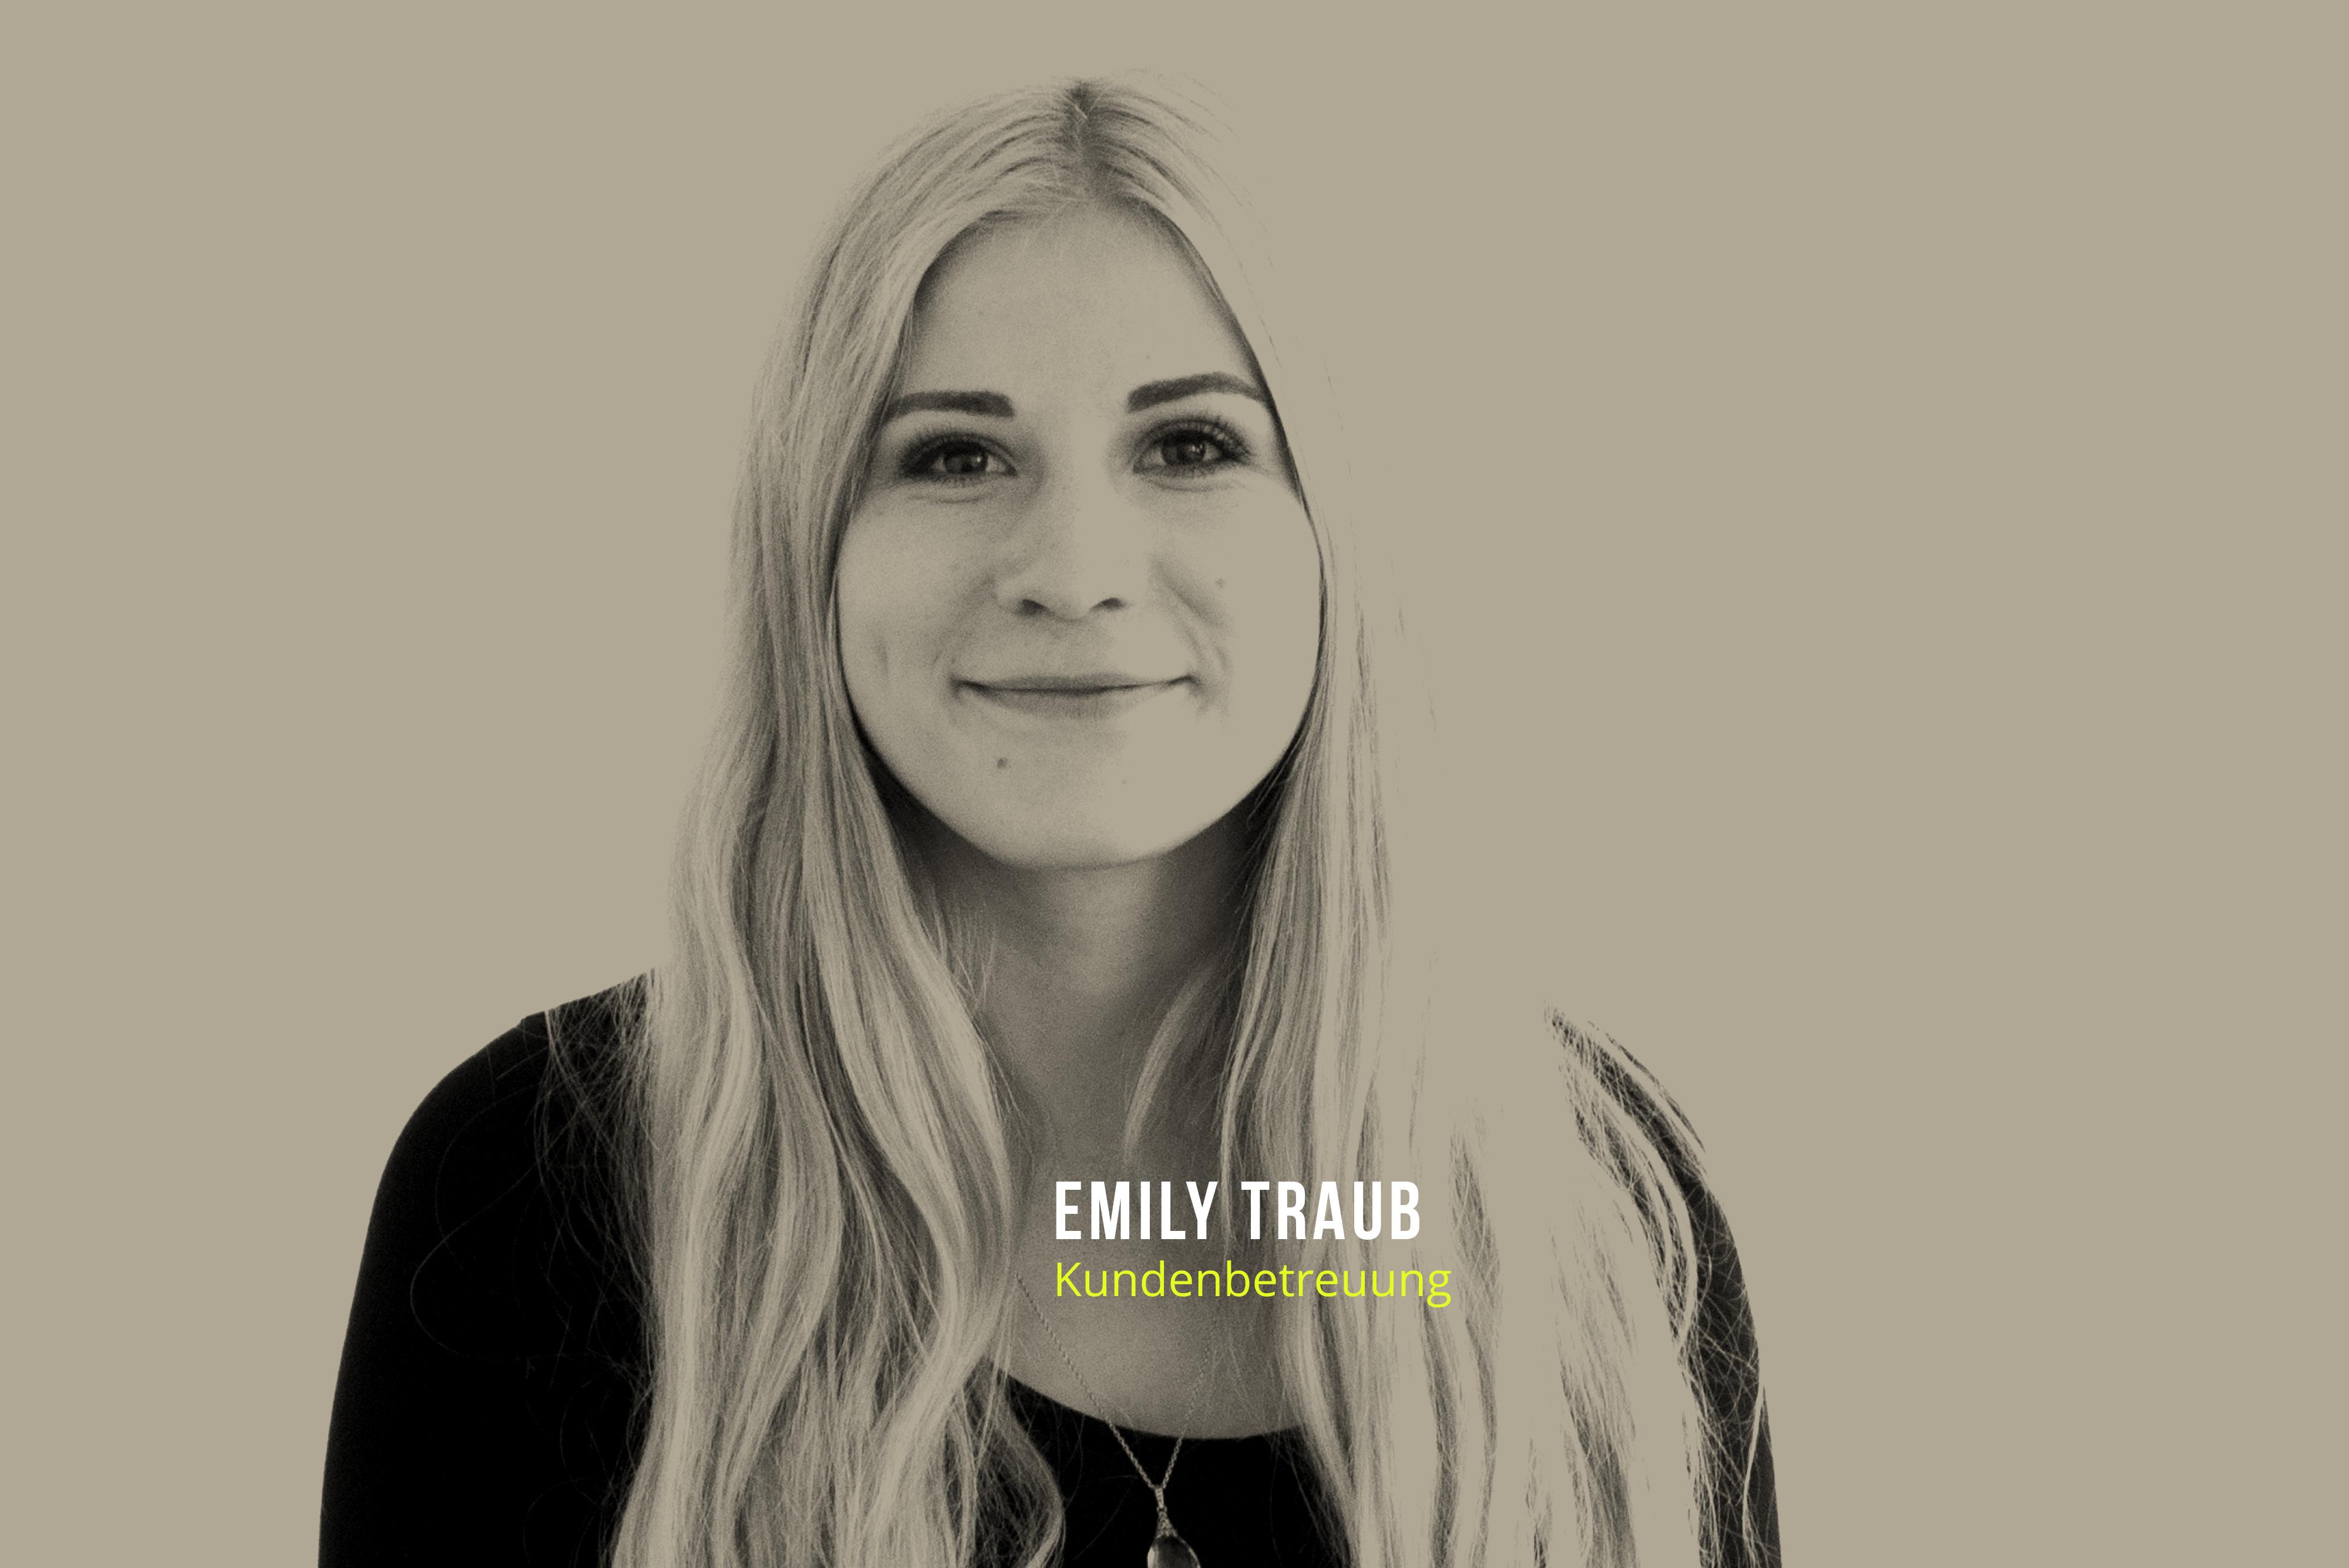 Emily Traub Kundenbetreuung